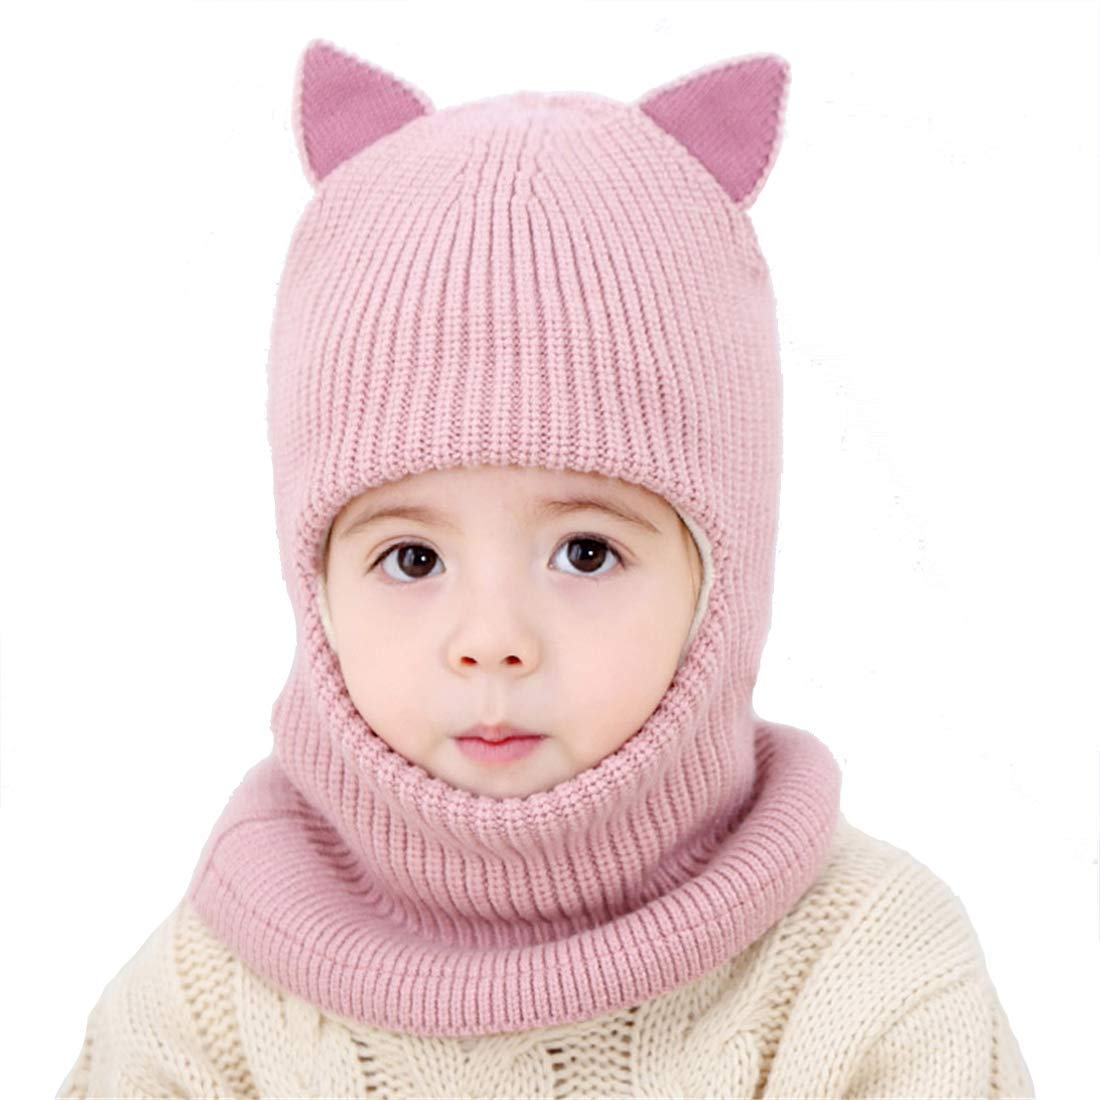 Rgslon Baby Girl's Warm Hat Scarf Kid Fleece Lined Earflap Caps Windproof Balacalva